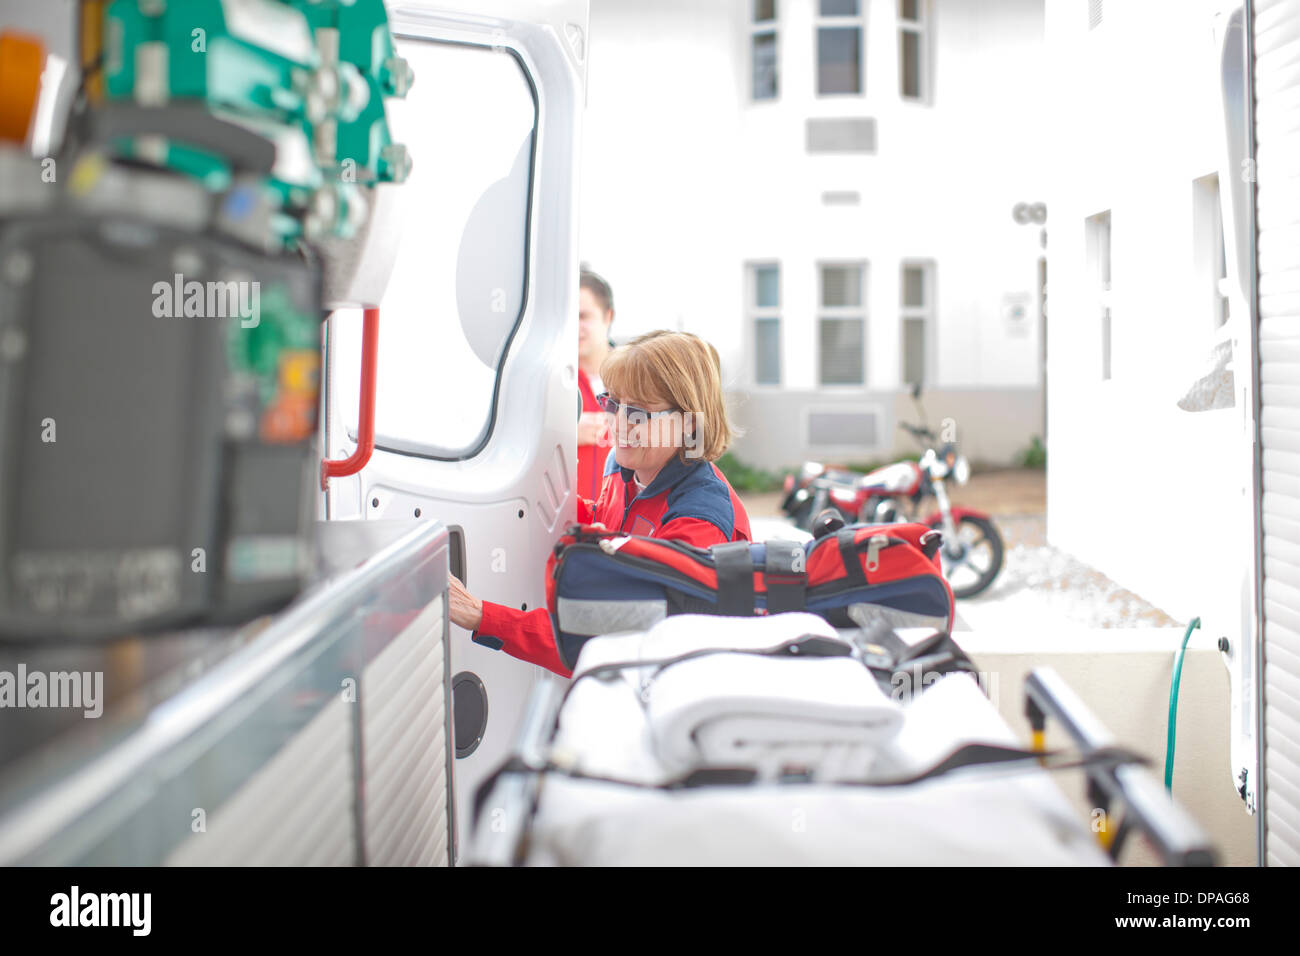 Paramedic opening ambulance door - Stock Image